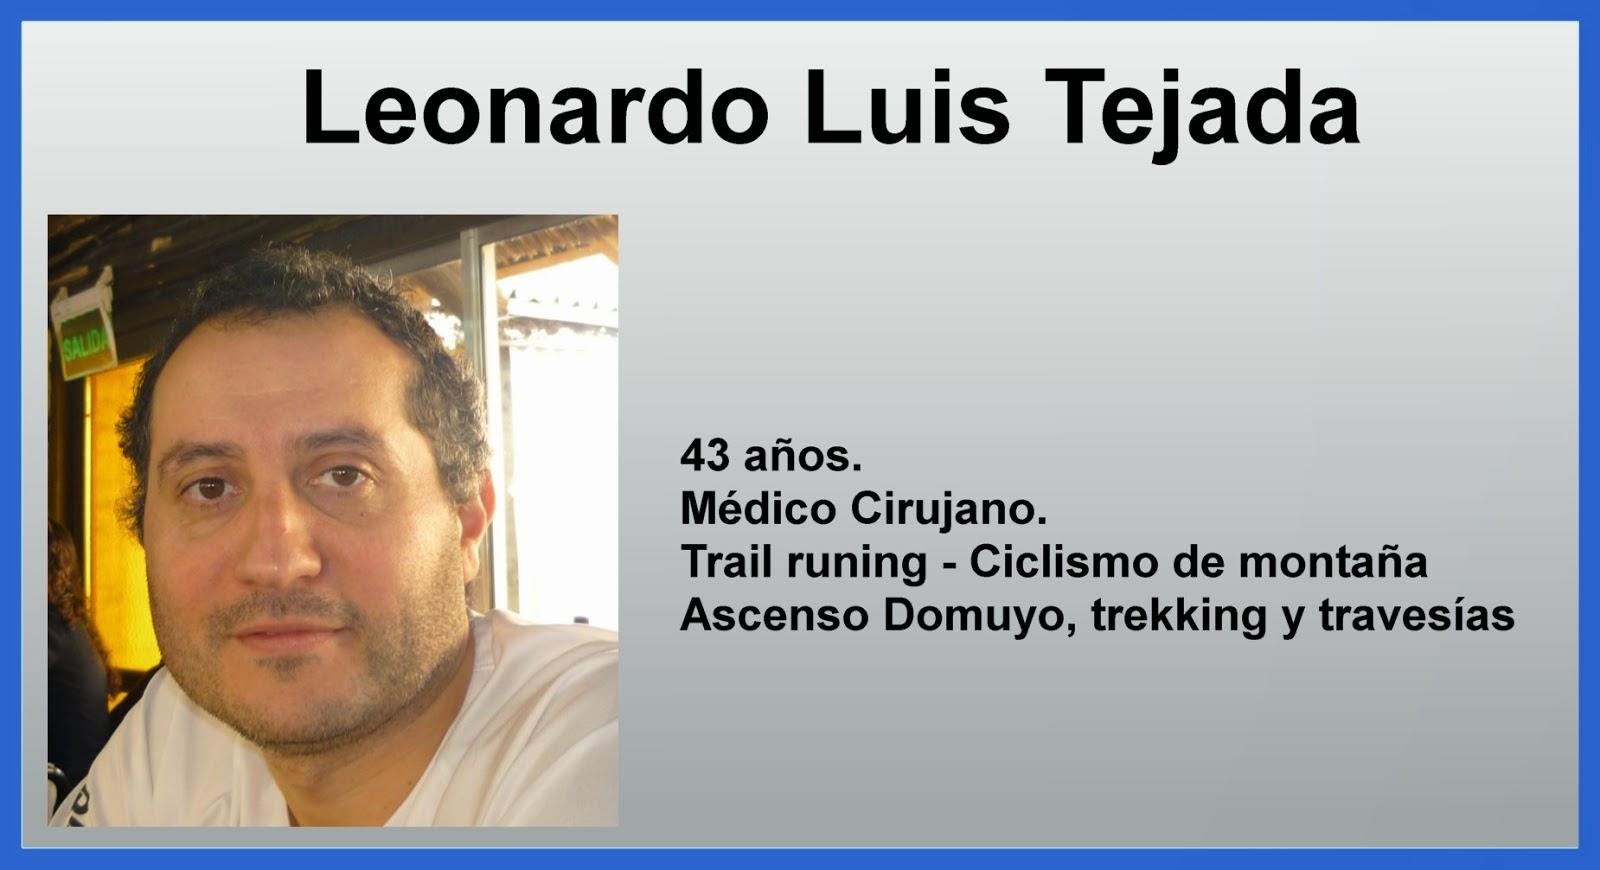 https://www.facebook.com/leonardo.tejada.923?fref=ts